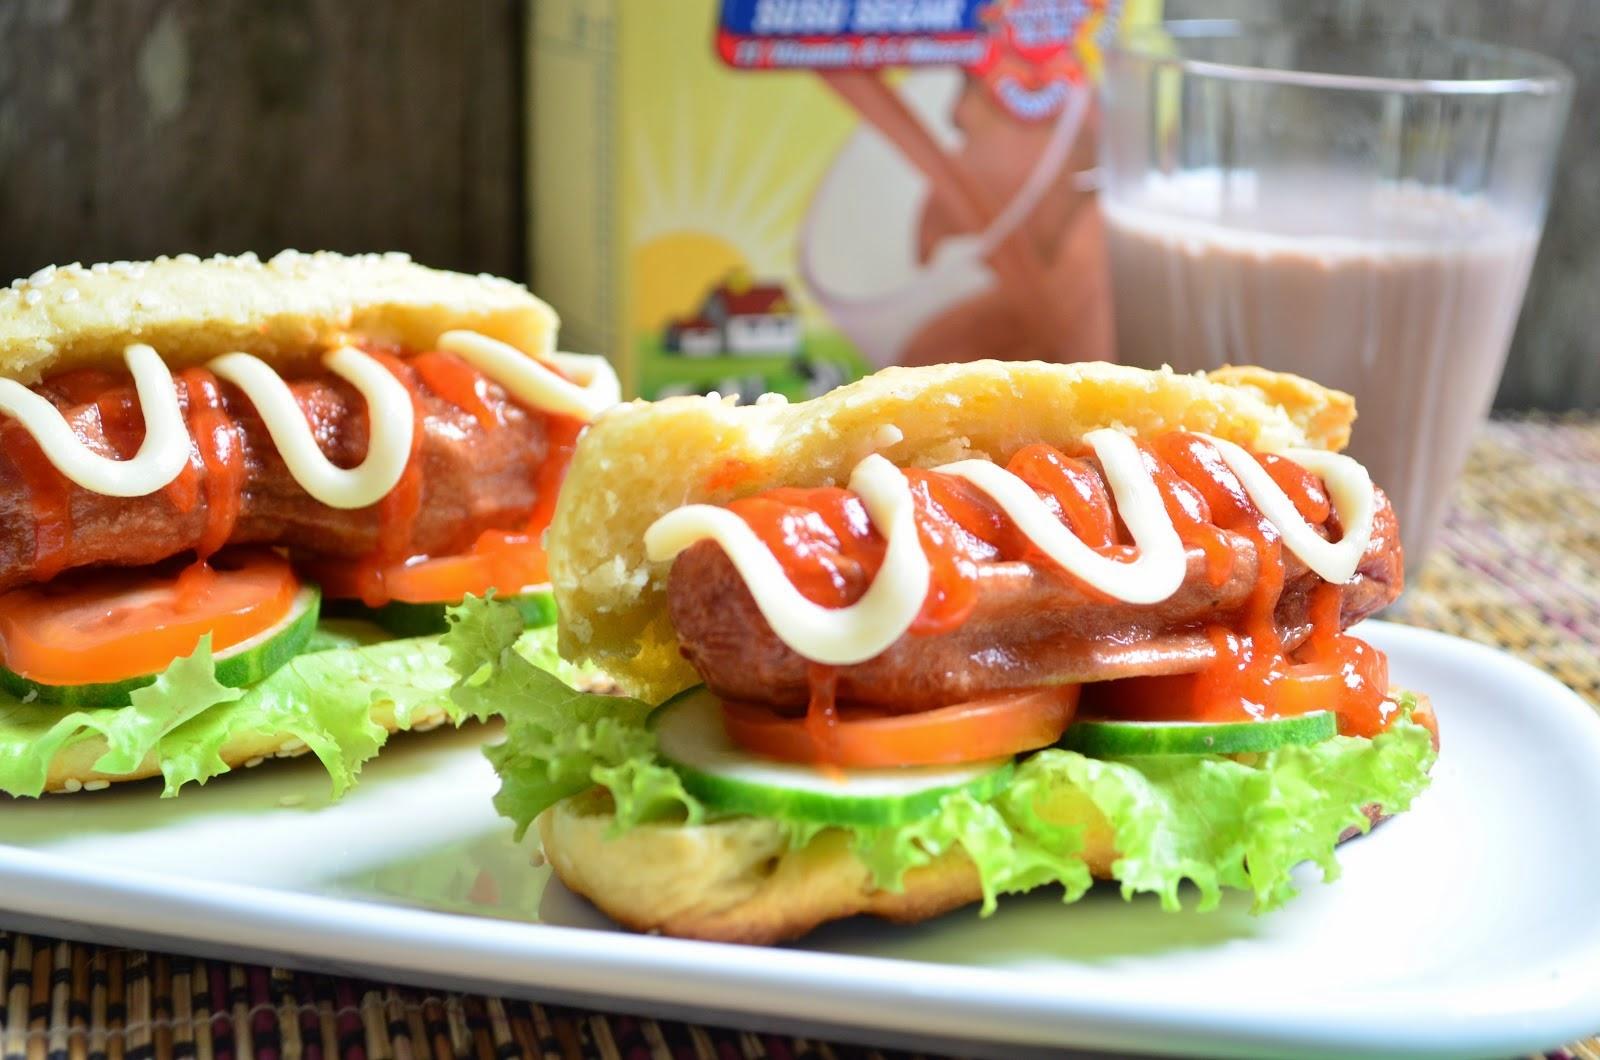 Resep hotdog